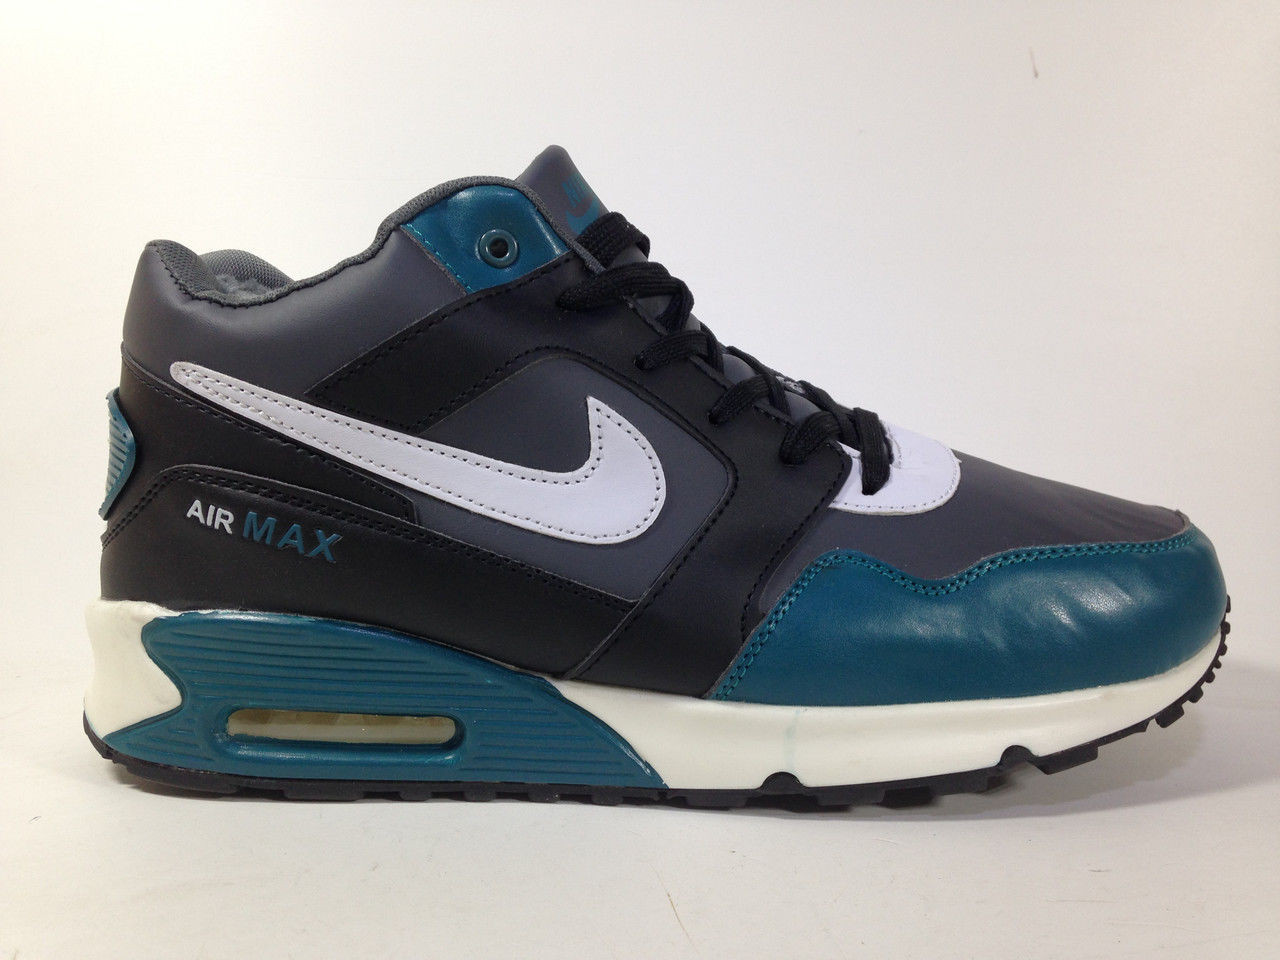 Зимние кроссовки Nike Air Max на меху 46 размер (29,5 см) (реплика)